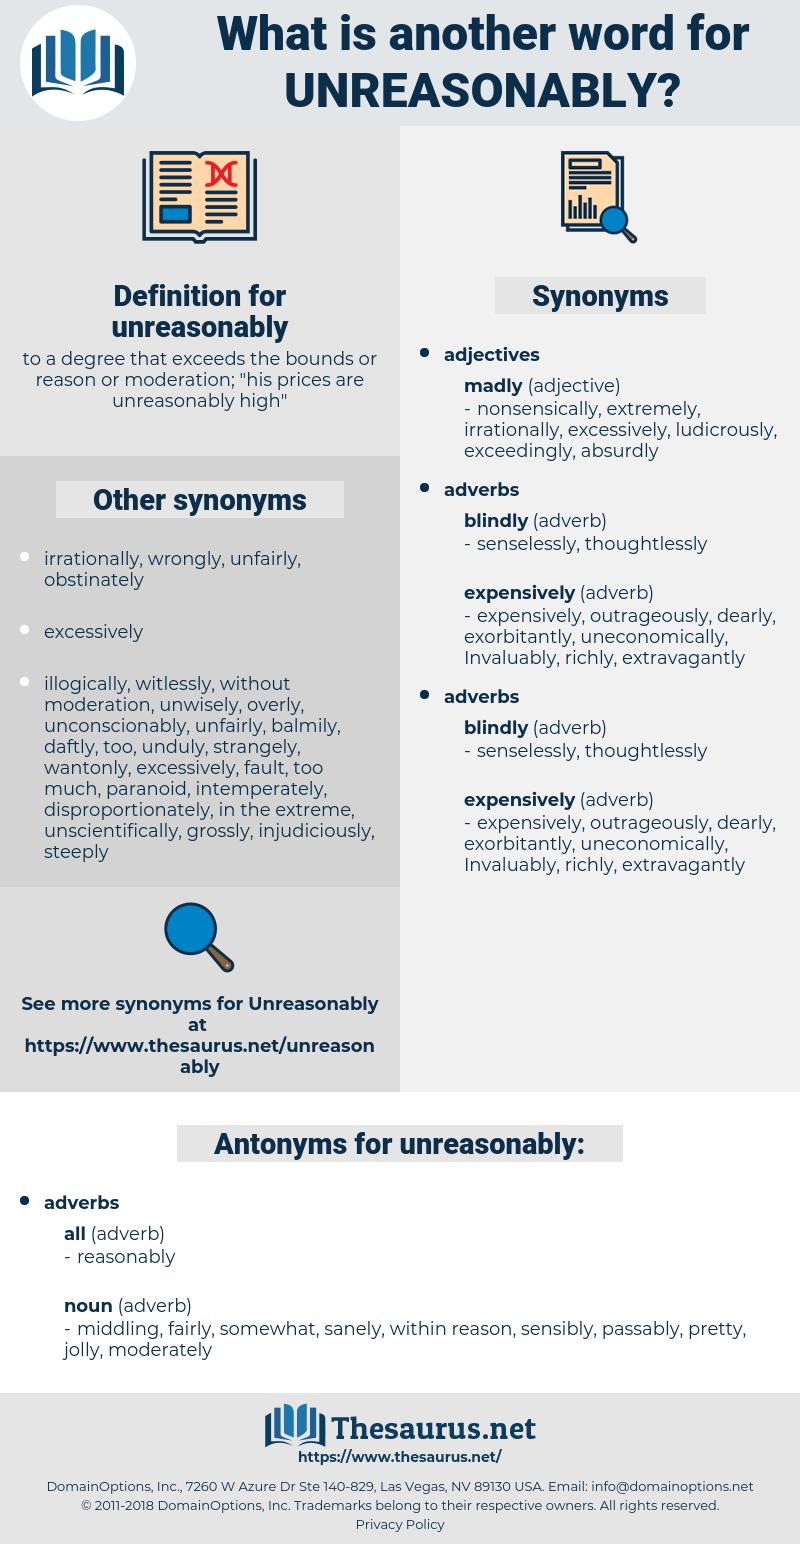 unreasonably, synonym unreasonably, another word for unreasonably, words like unreasonably, thesaurus unreasonably